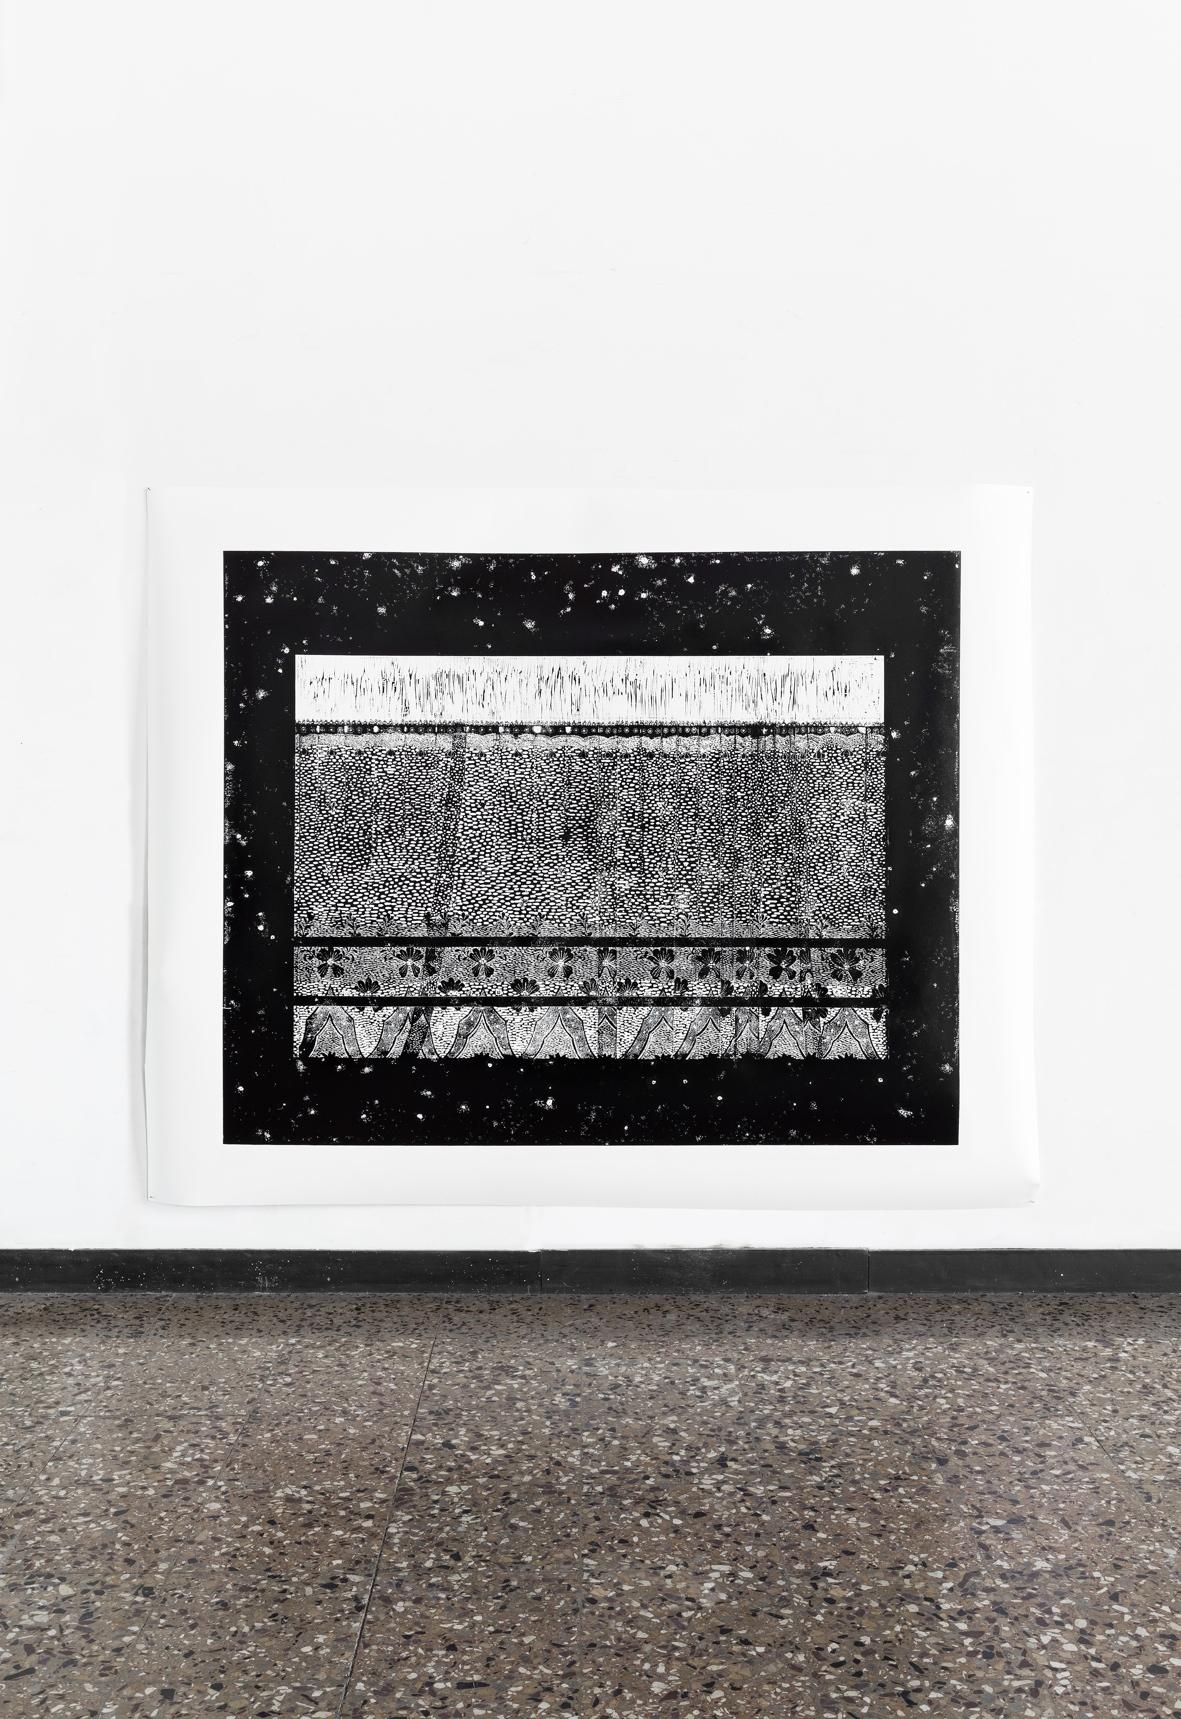 Fenster_groß_10x15